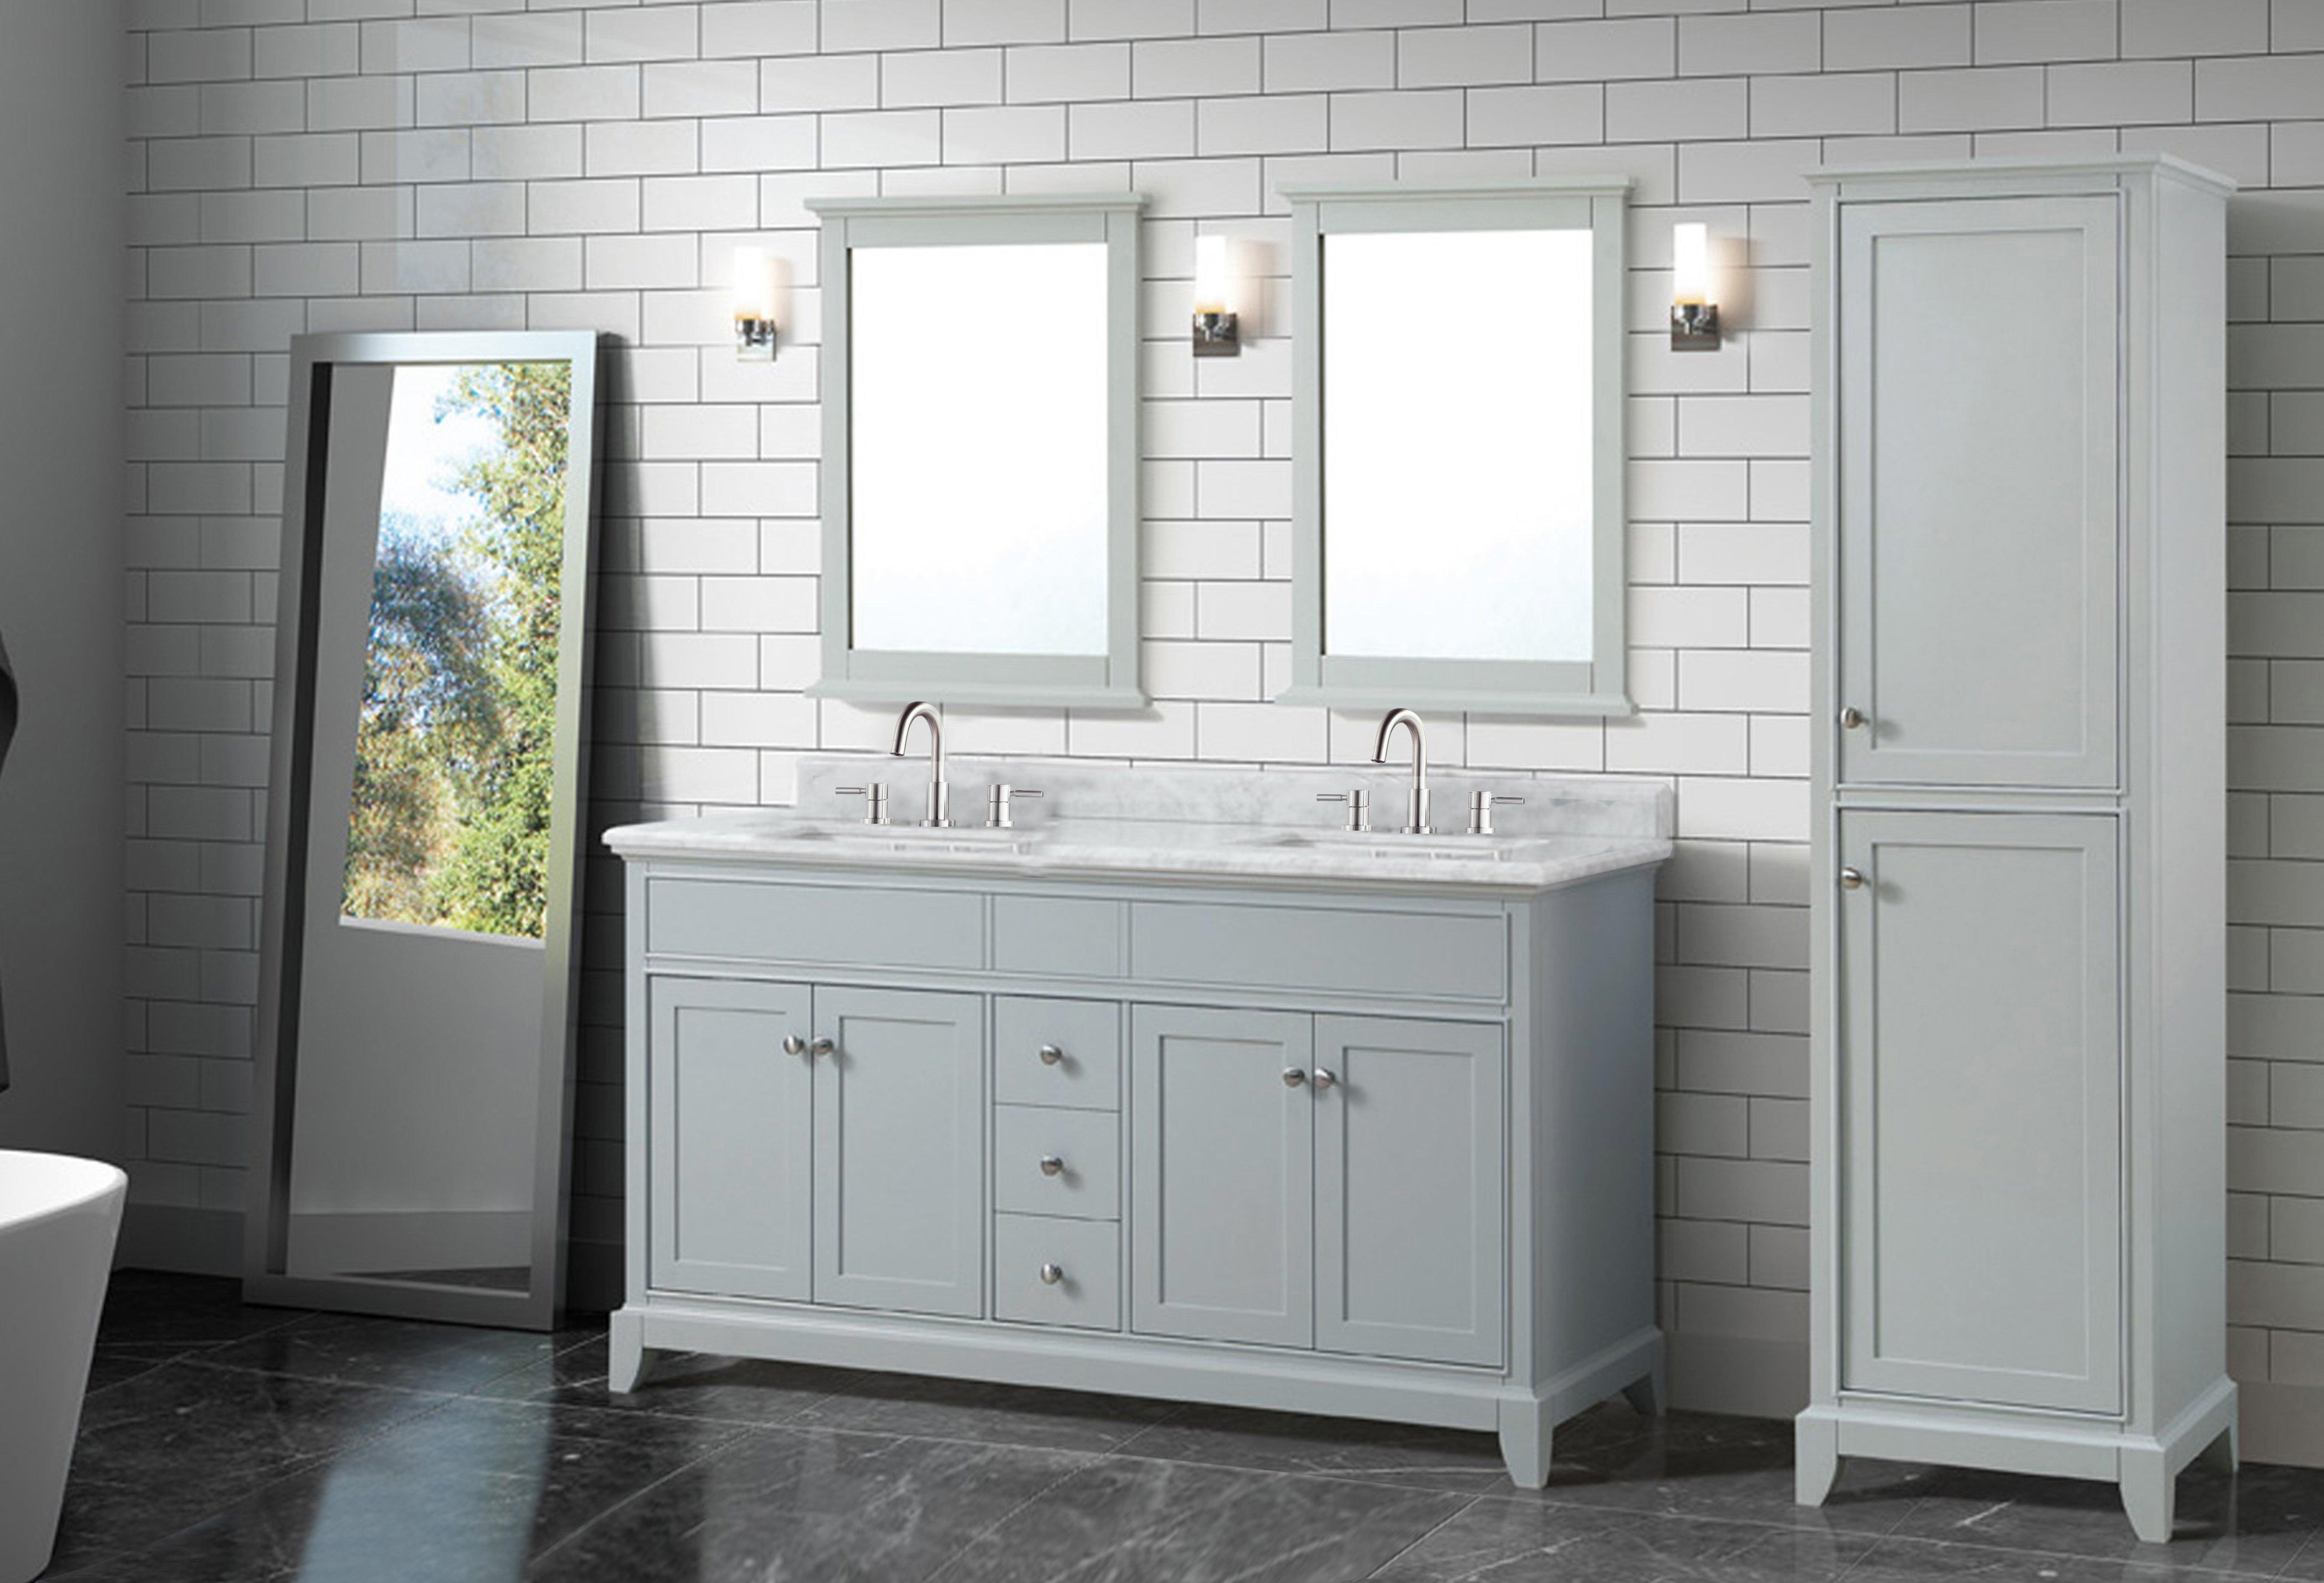 How To Choose A Bathroom Vanity Floor Decor